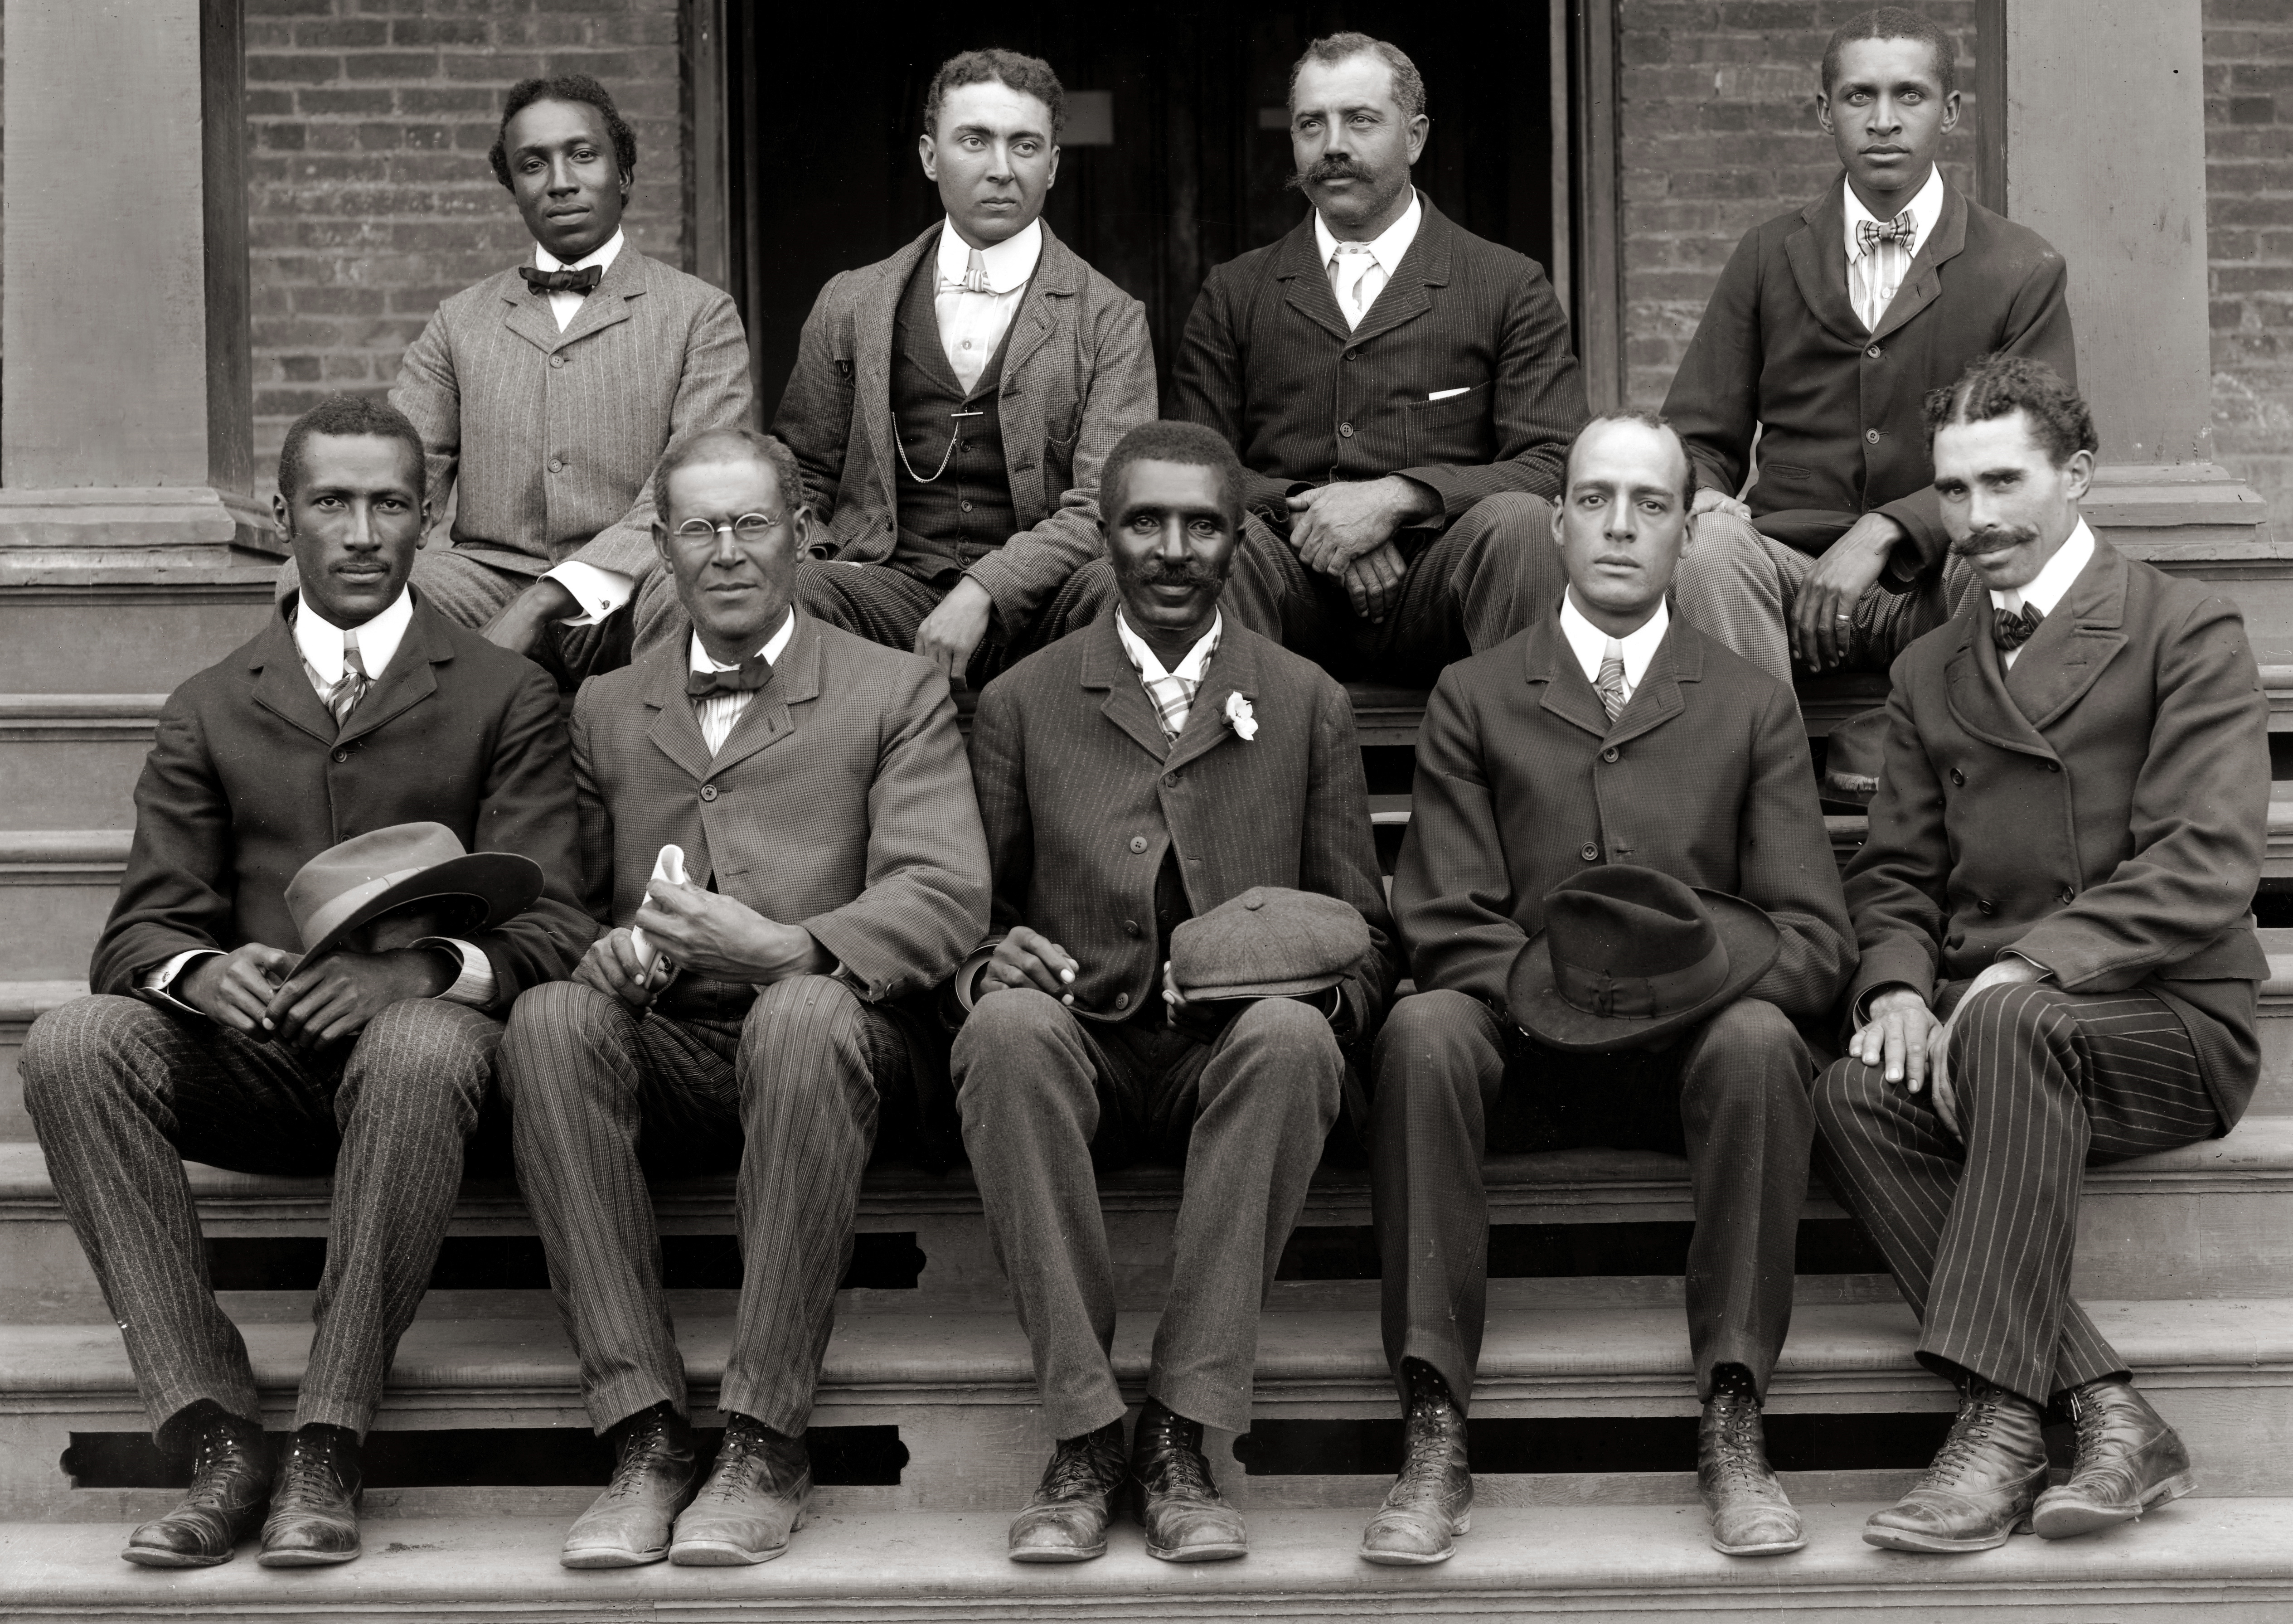 FileGeorge Washington Carver Ca 1902